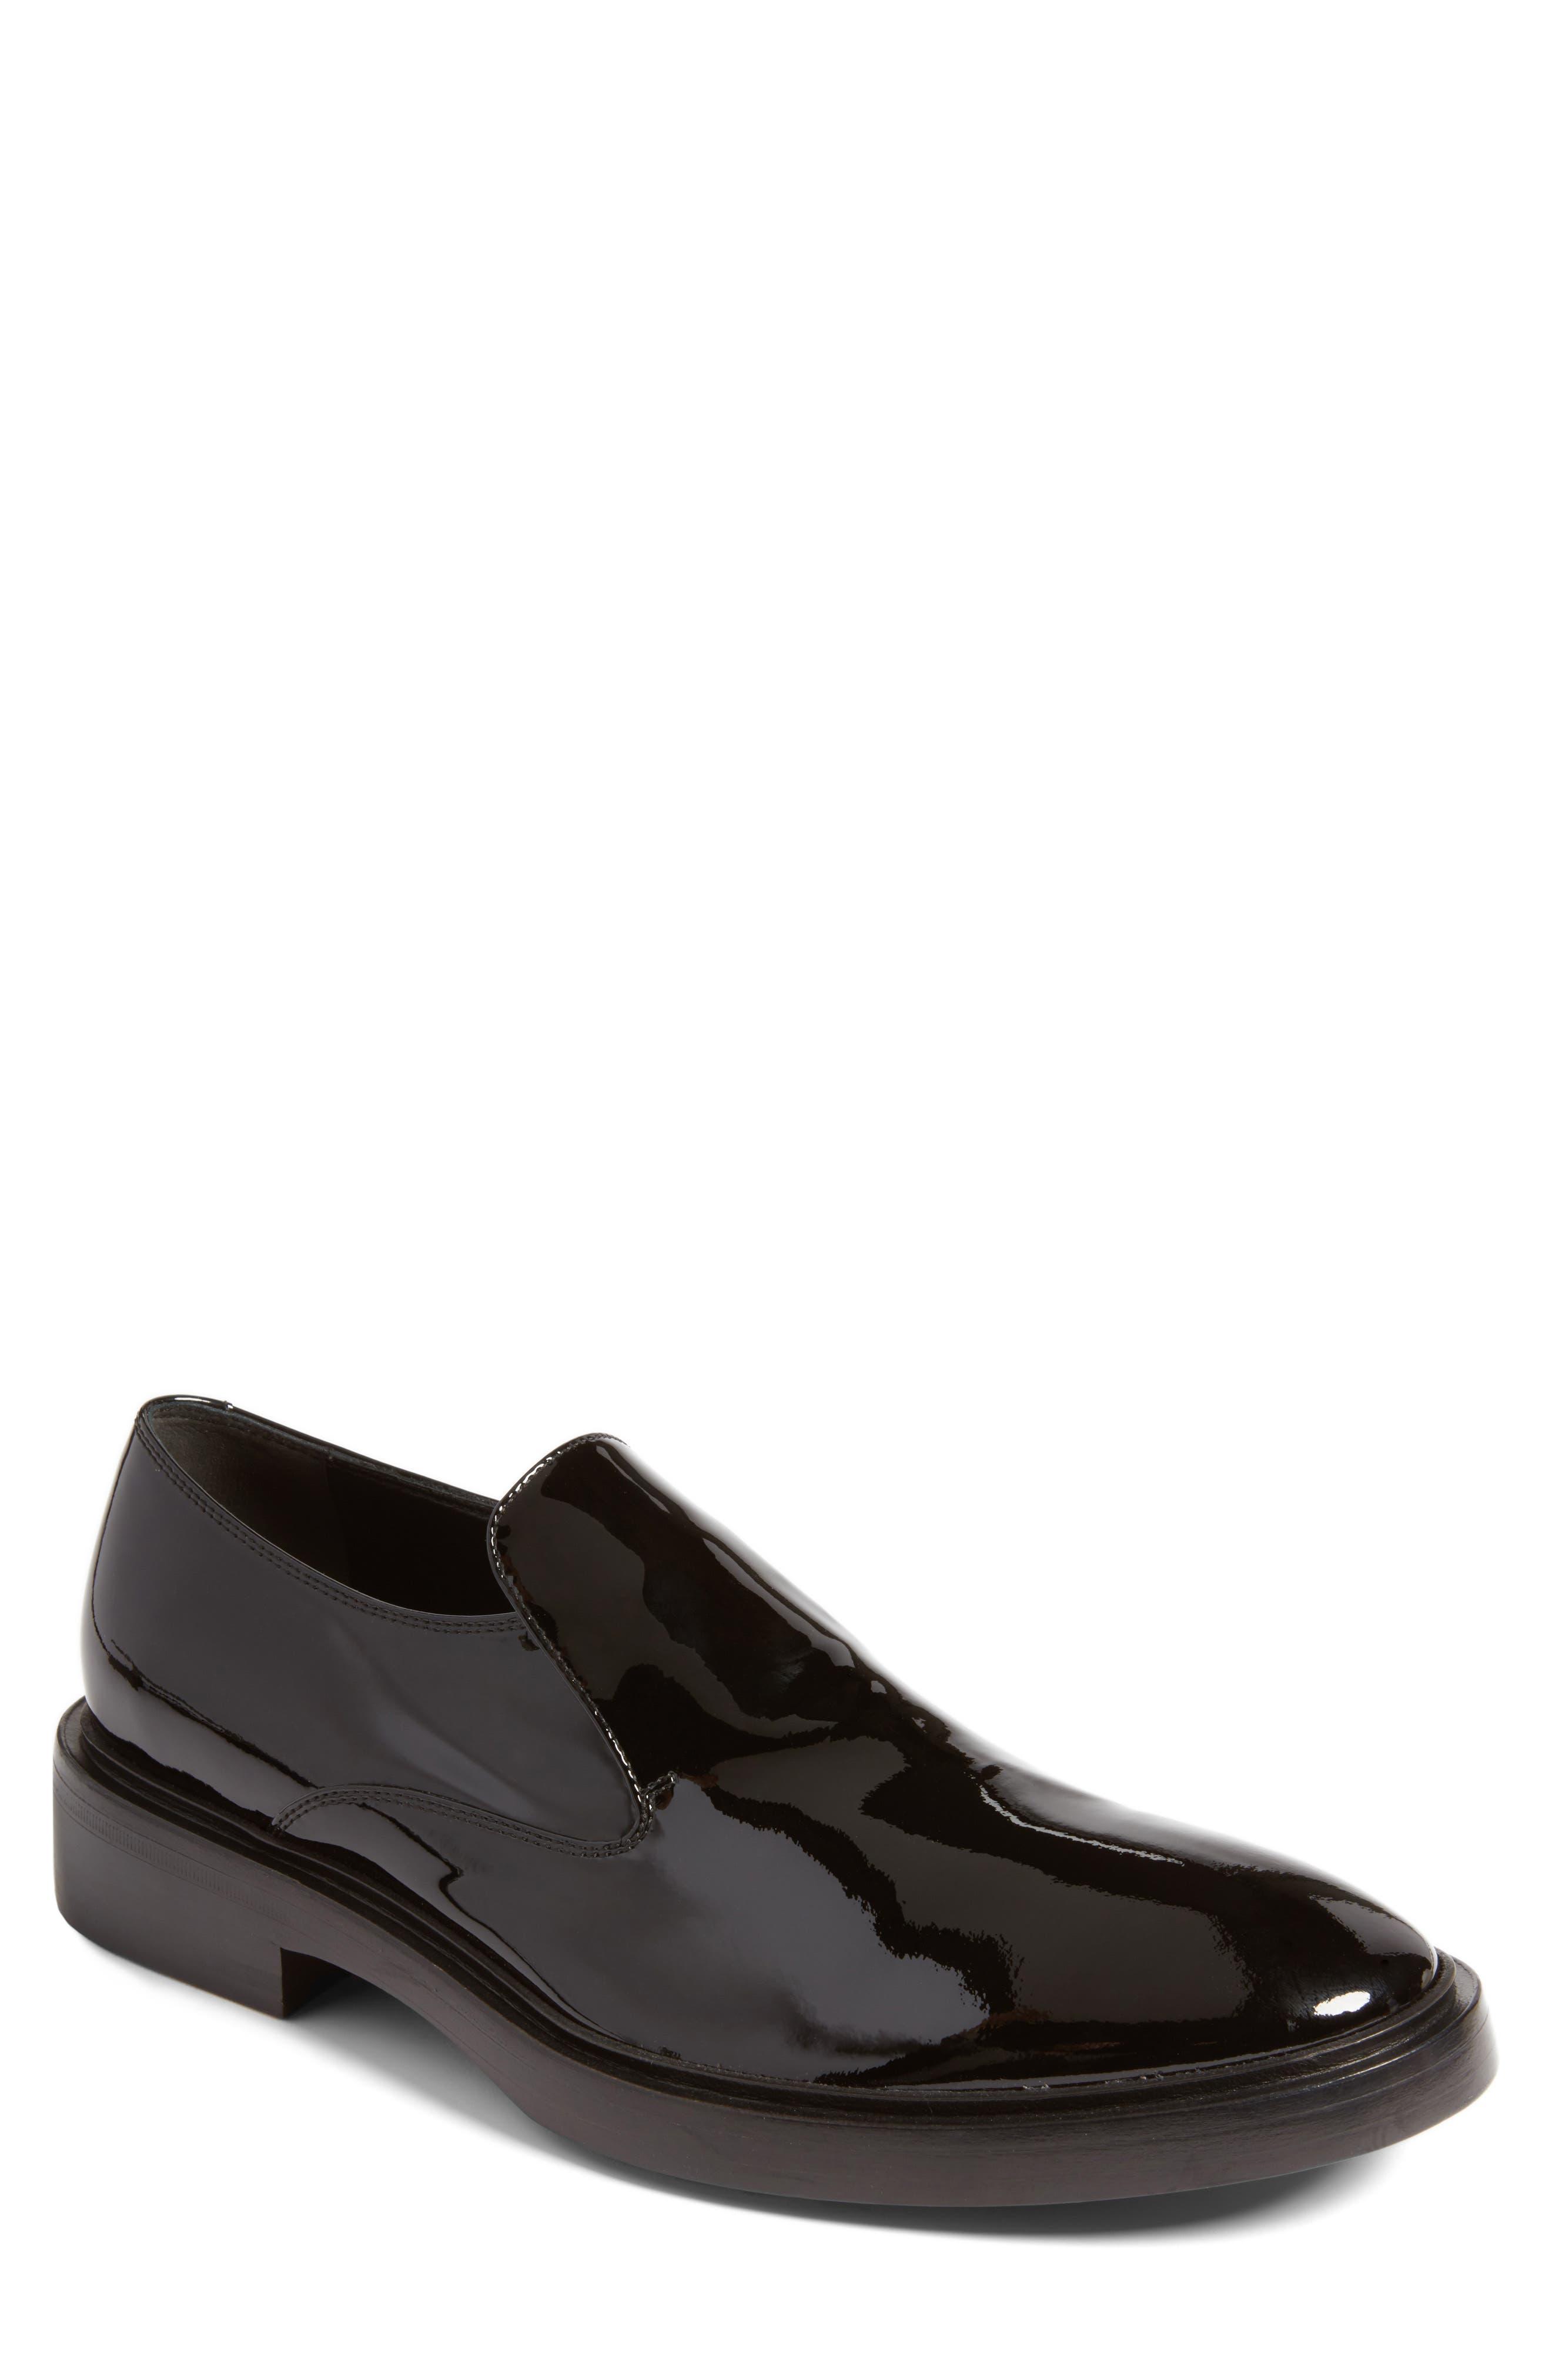 Venetian Loafer,                         Main,                         color, 001